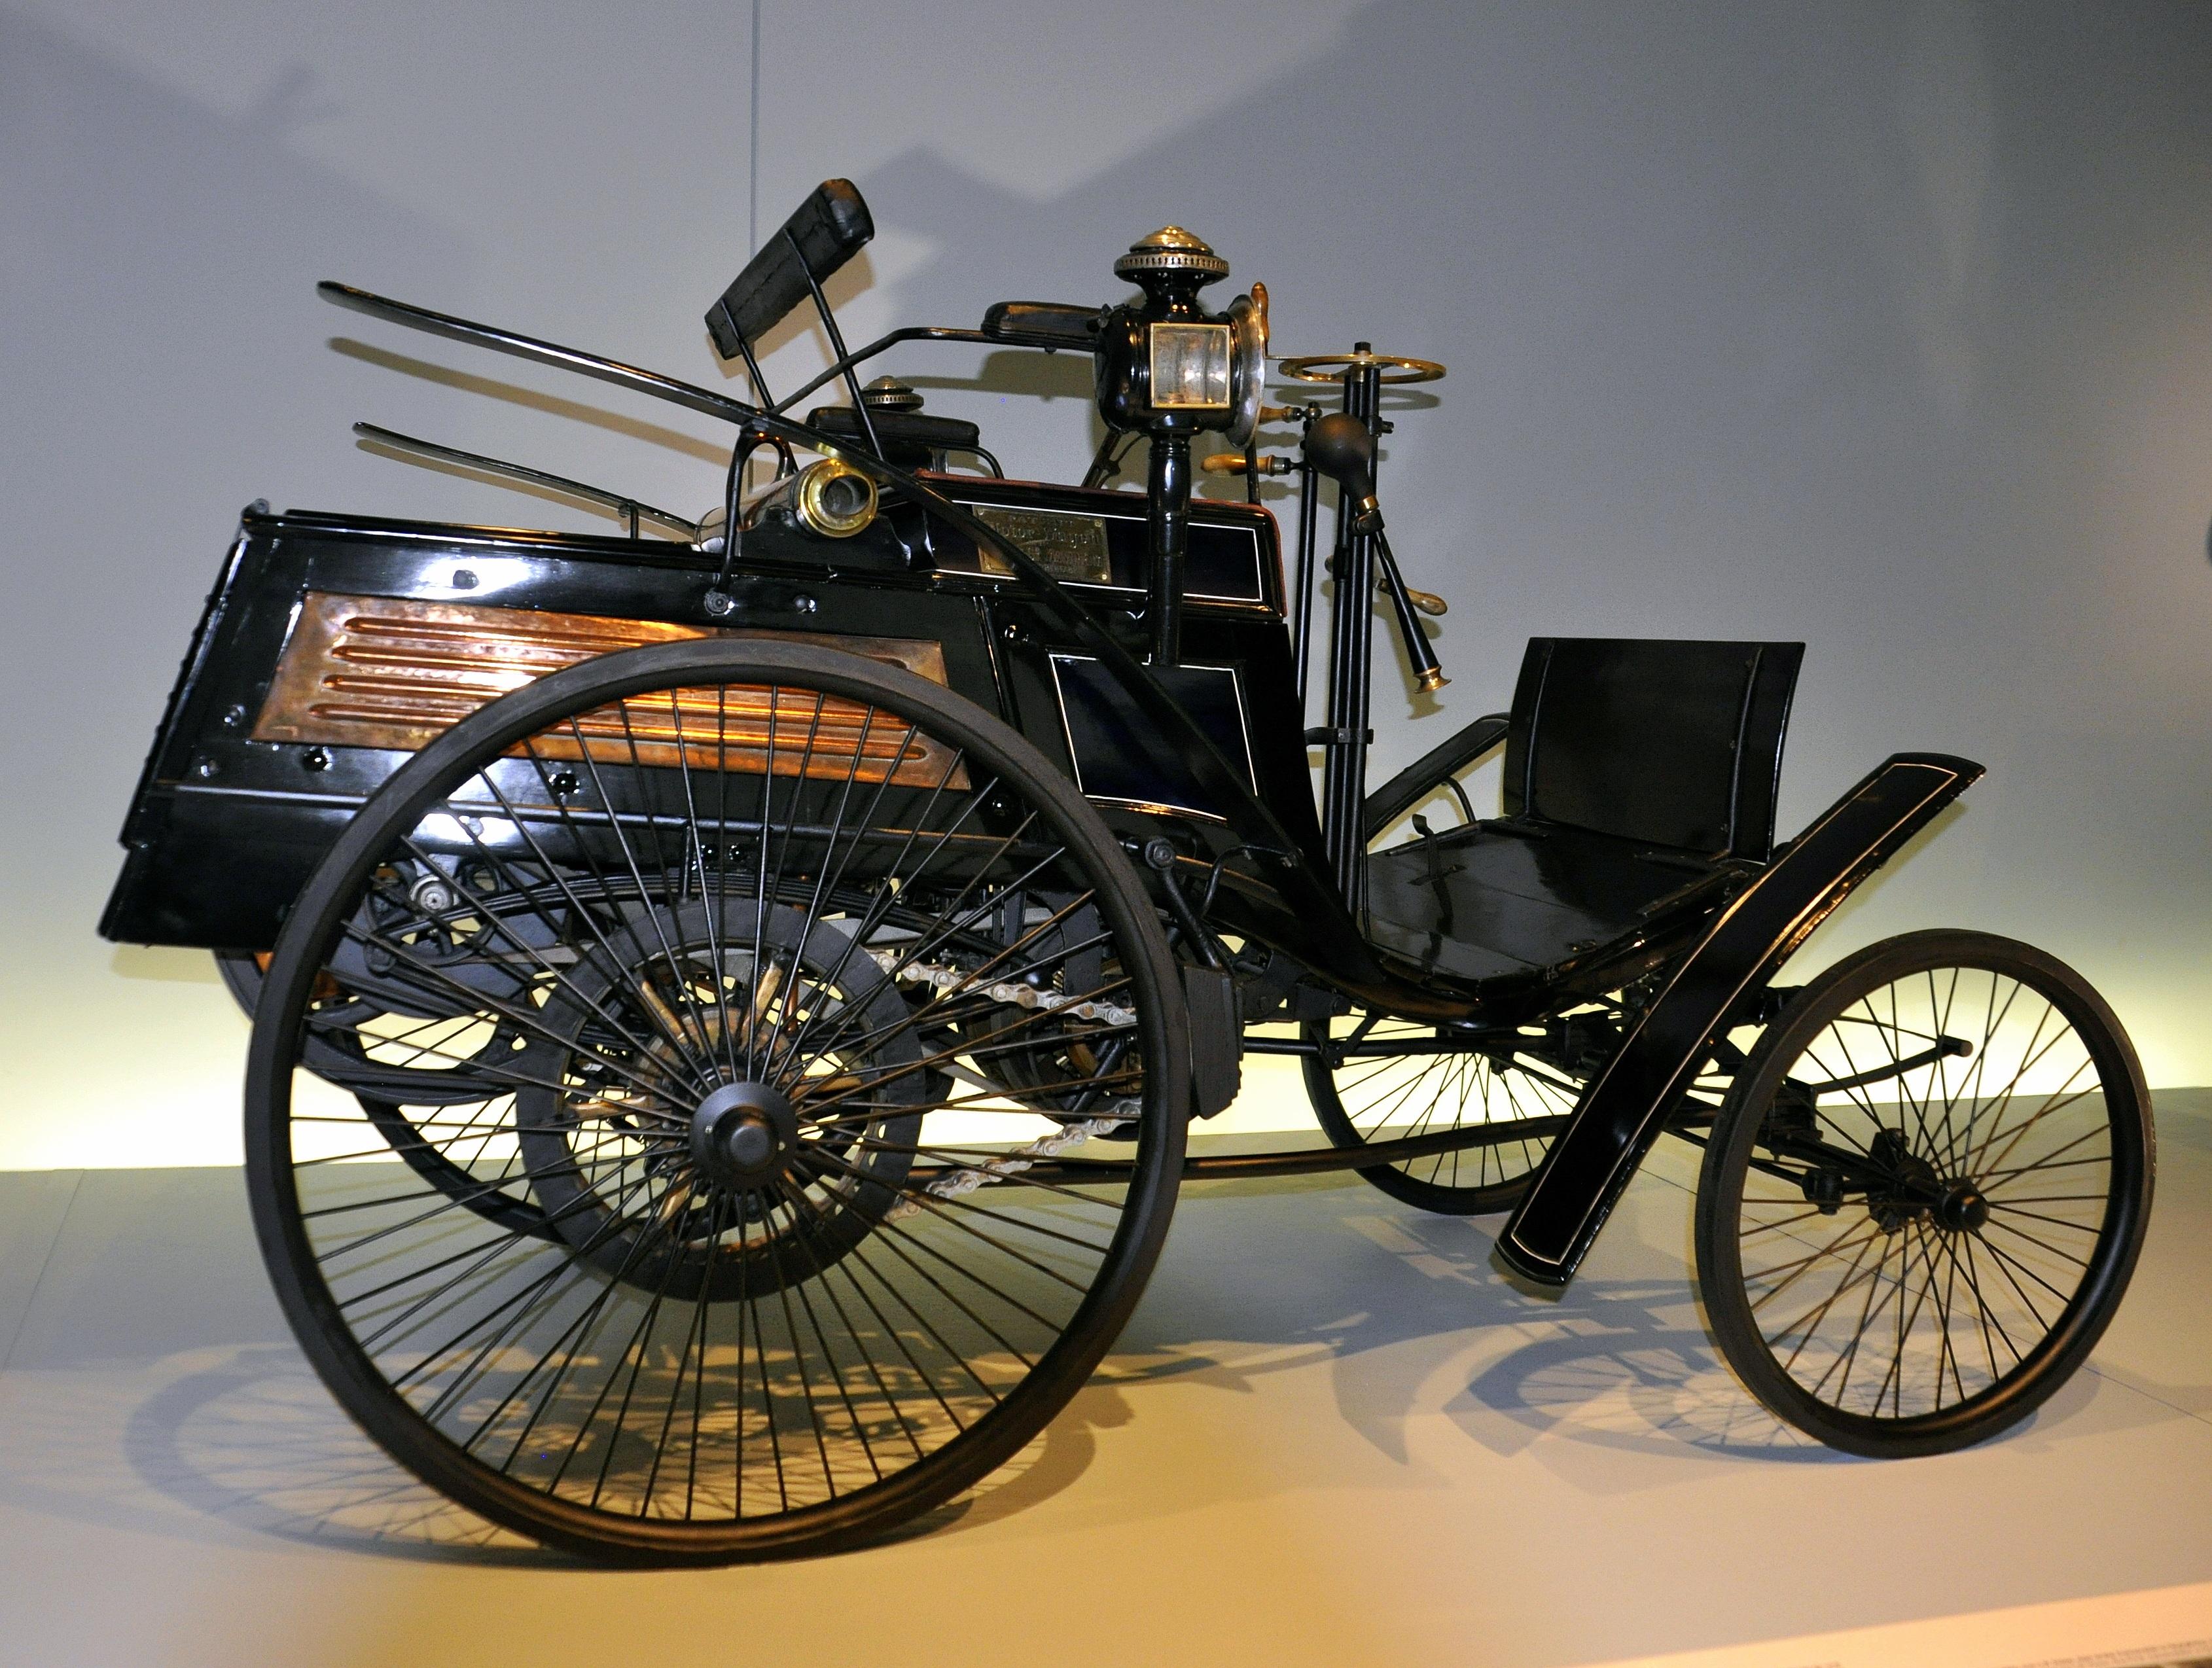 Classic Car Transport >> Fotos gratis : coche, rueda, transporte, vehículo, museo ...